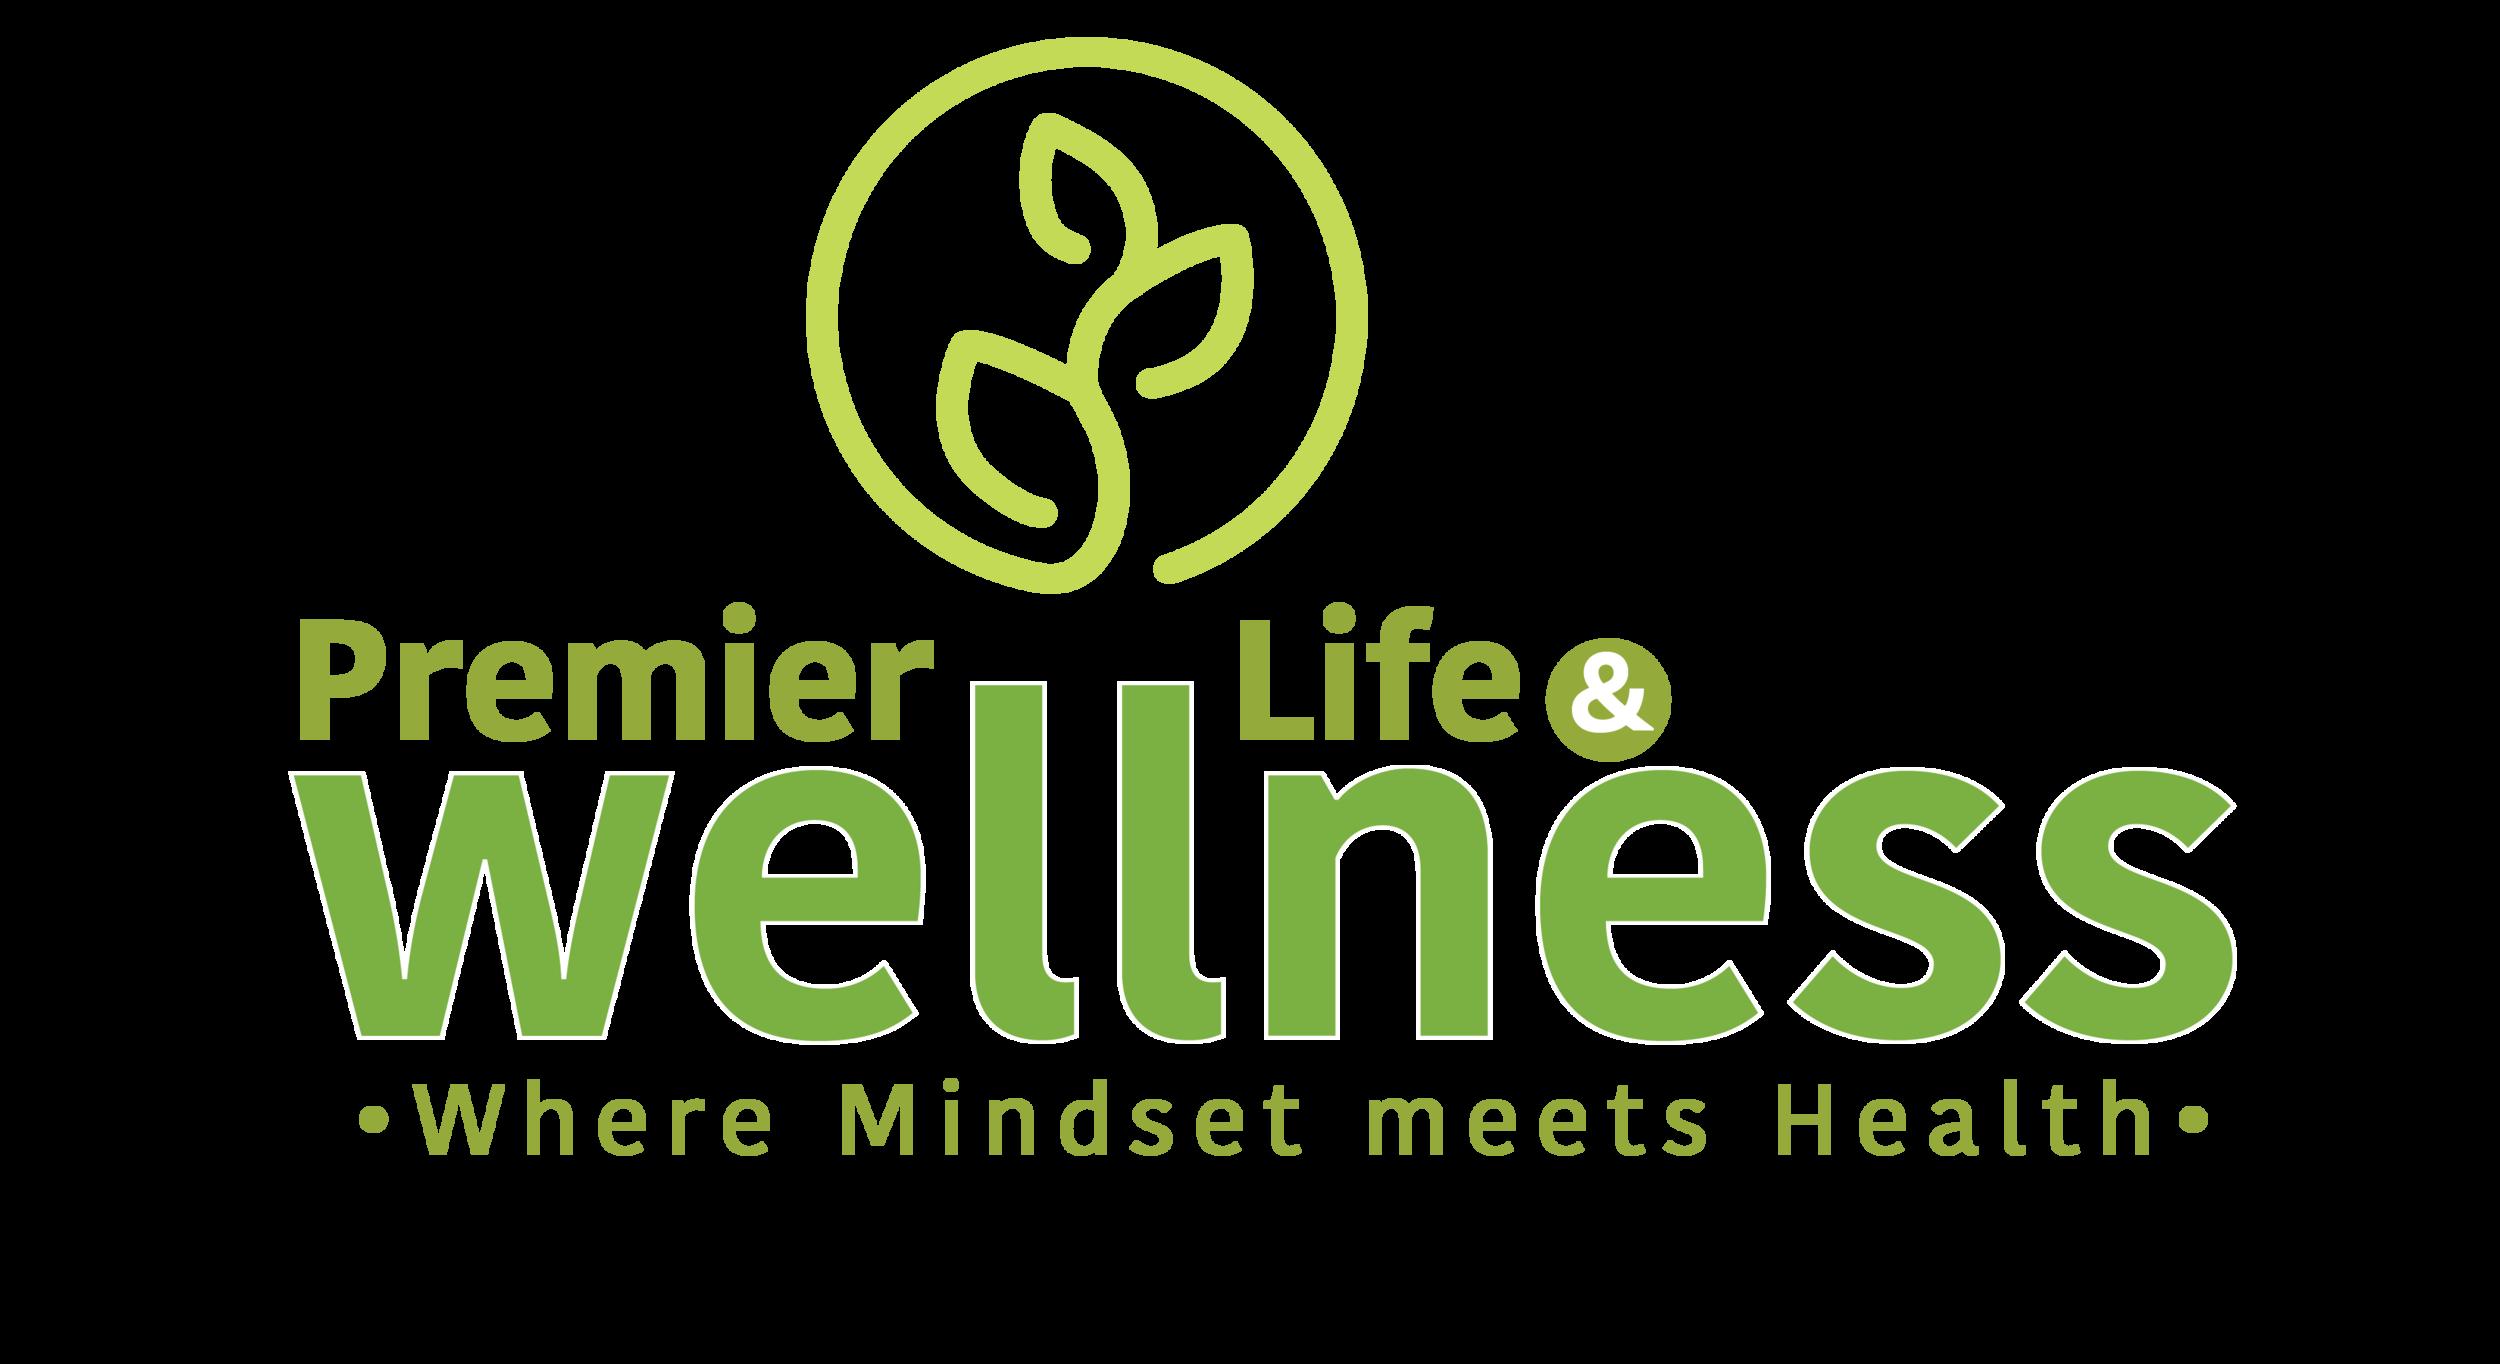 PremierLife&Wellness_LOGO-01.png